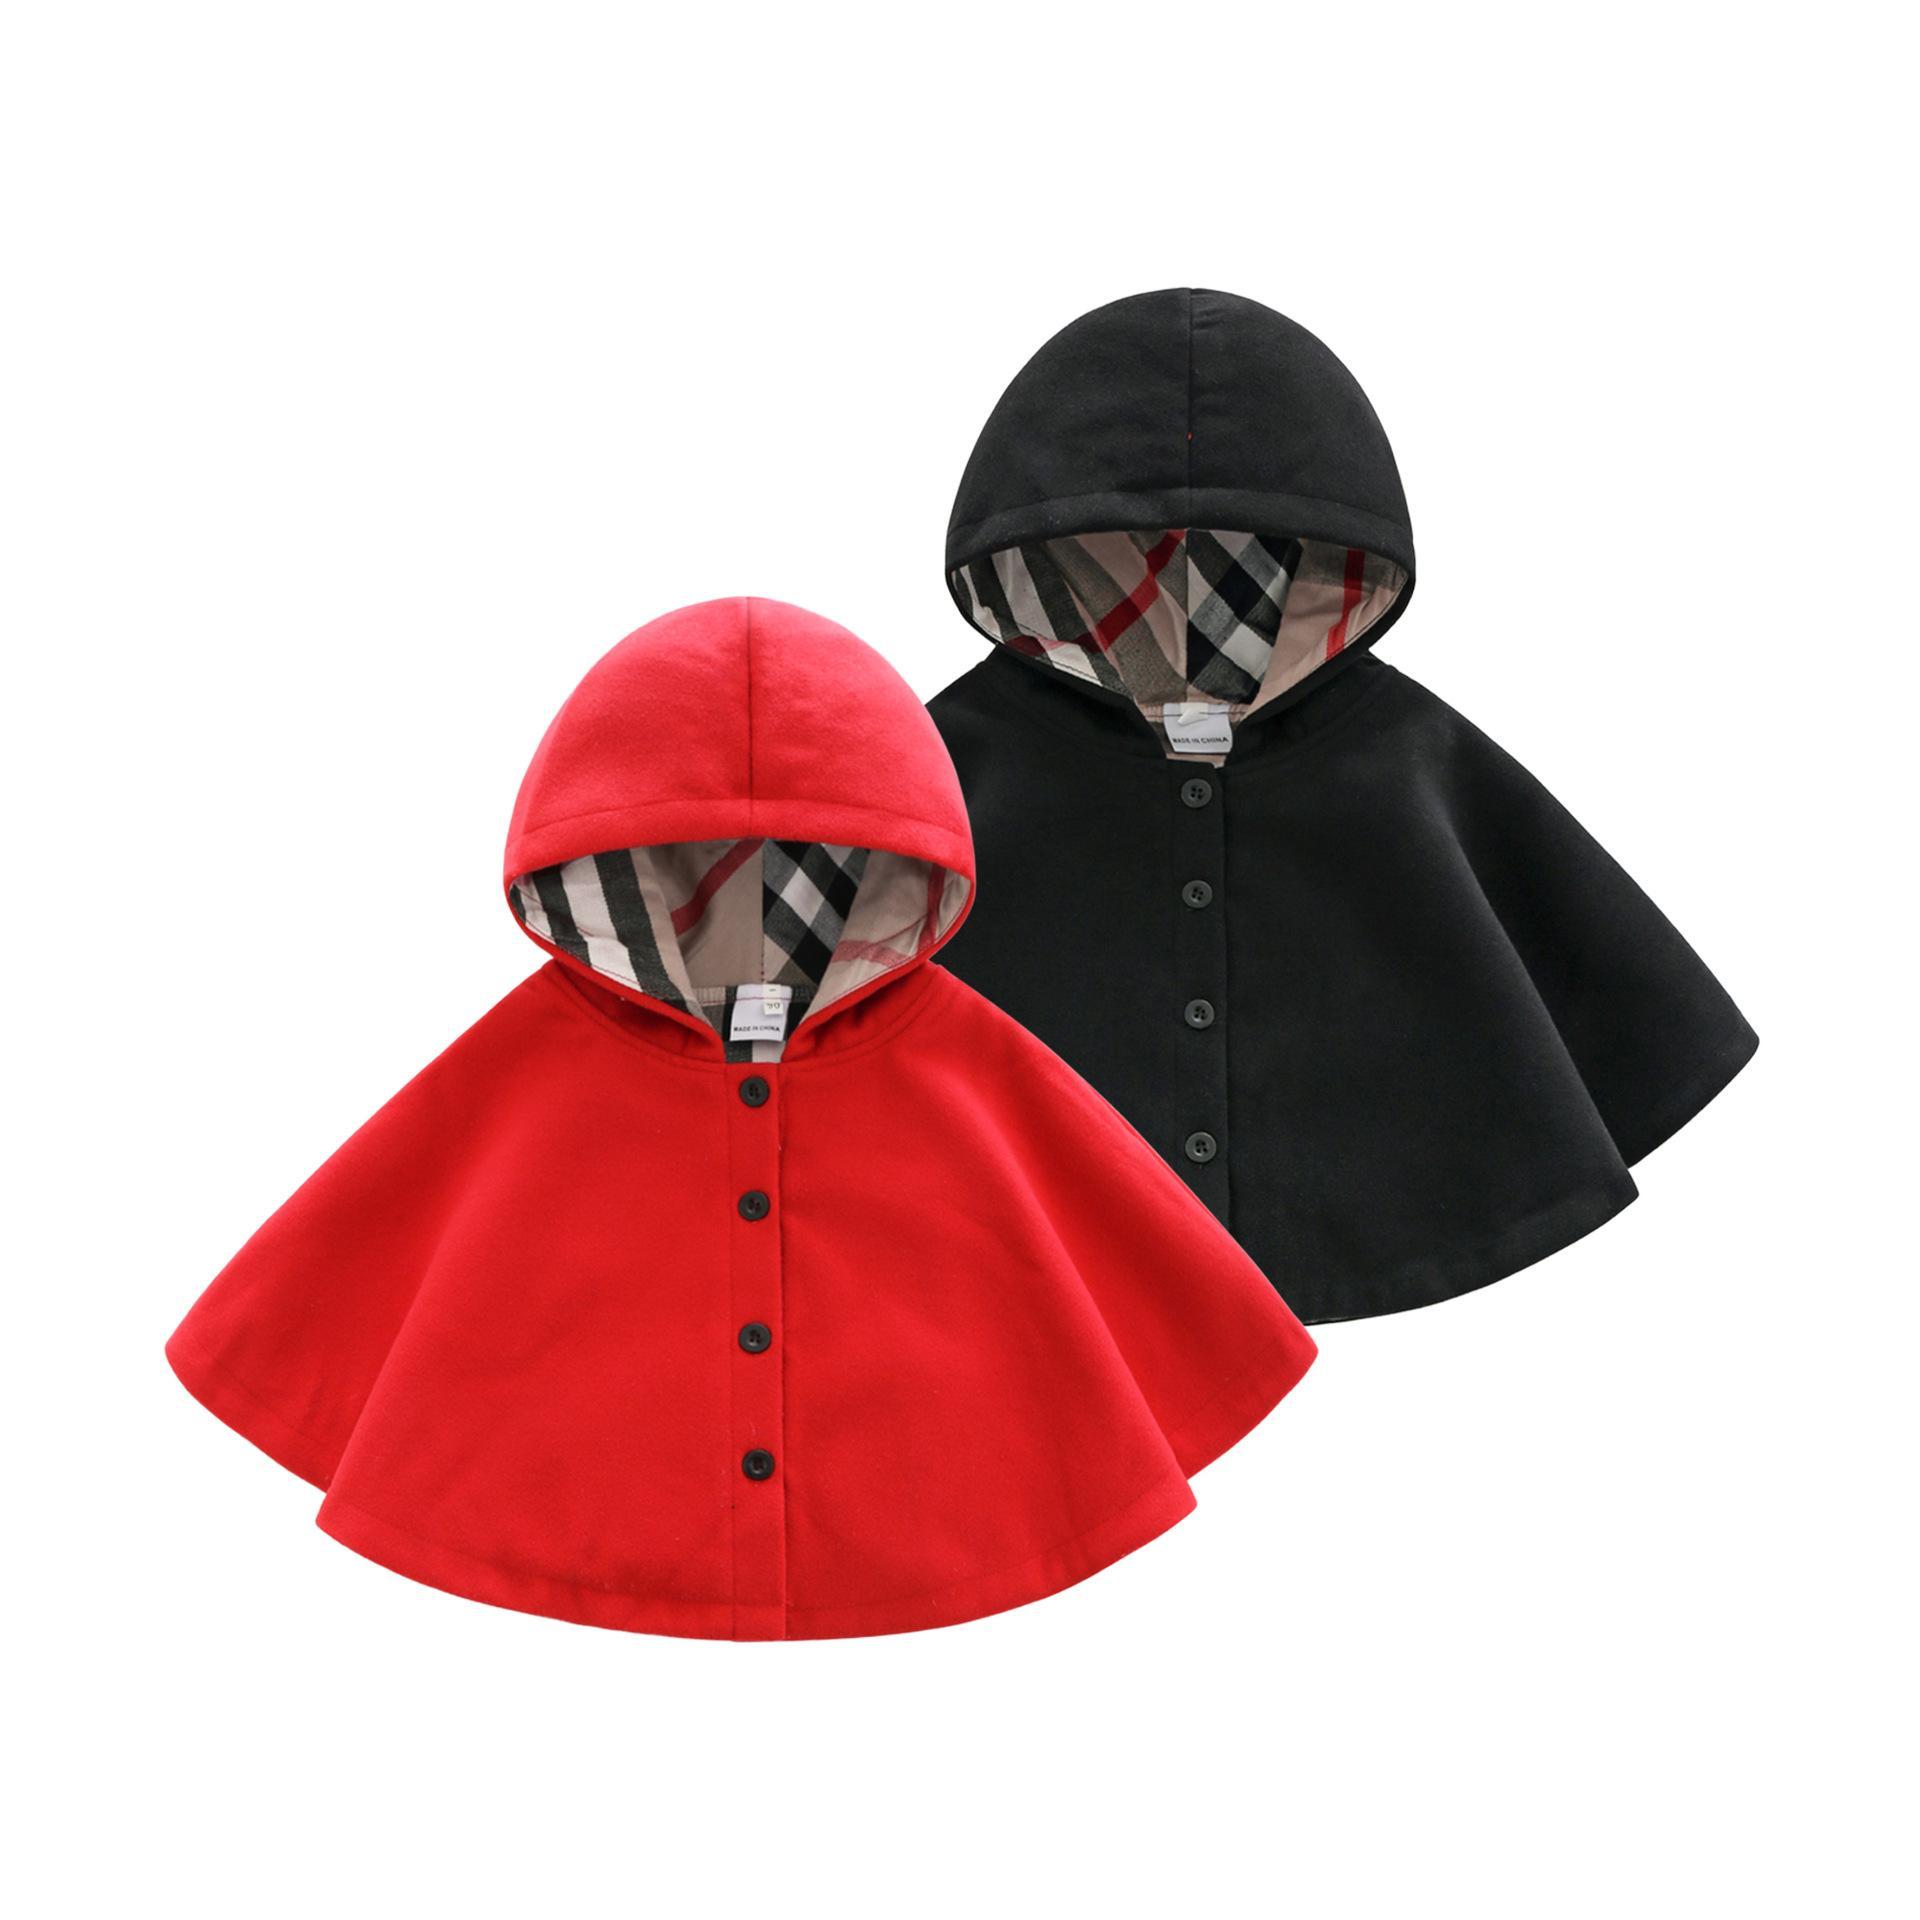 2020 Winter Frühlingsmode Kids Baby Cape Muster Schwarz Rote Baumwolle Mit Kapuze Plaid Girls Mantel Jacken Baby Mädchen Kap Cloaks Kleidung